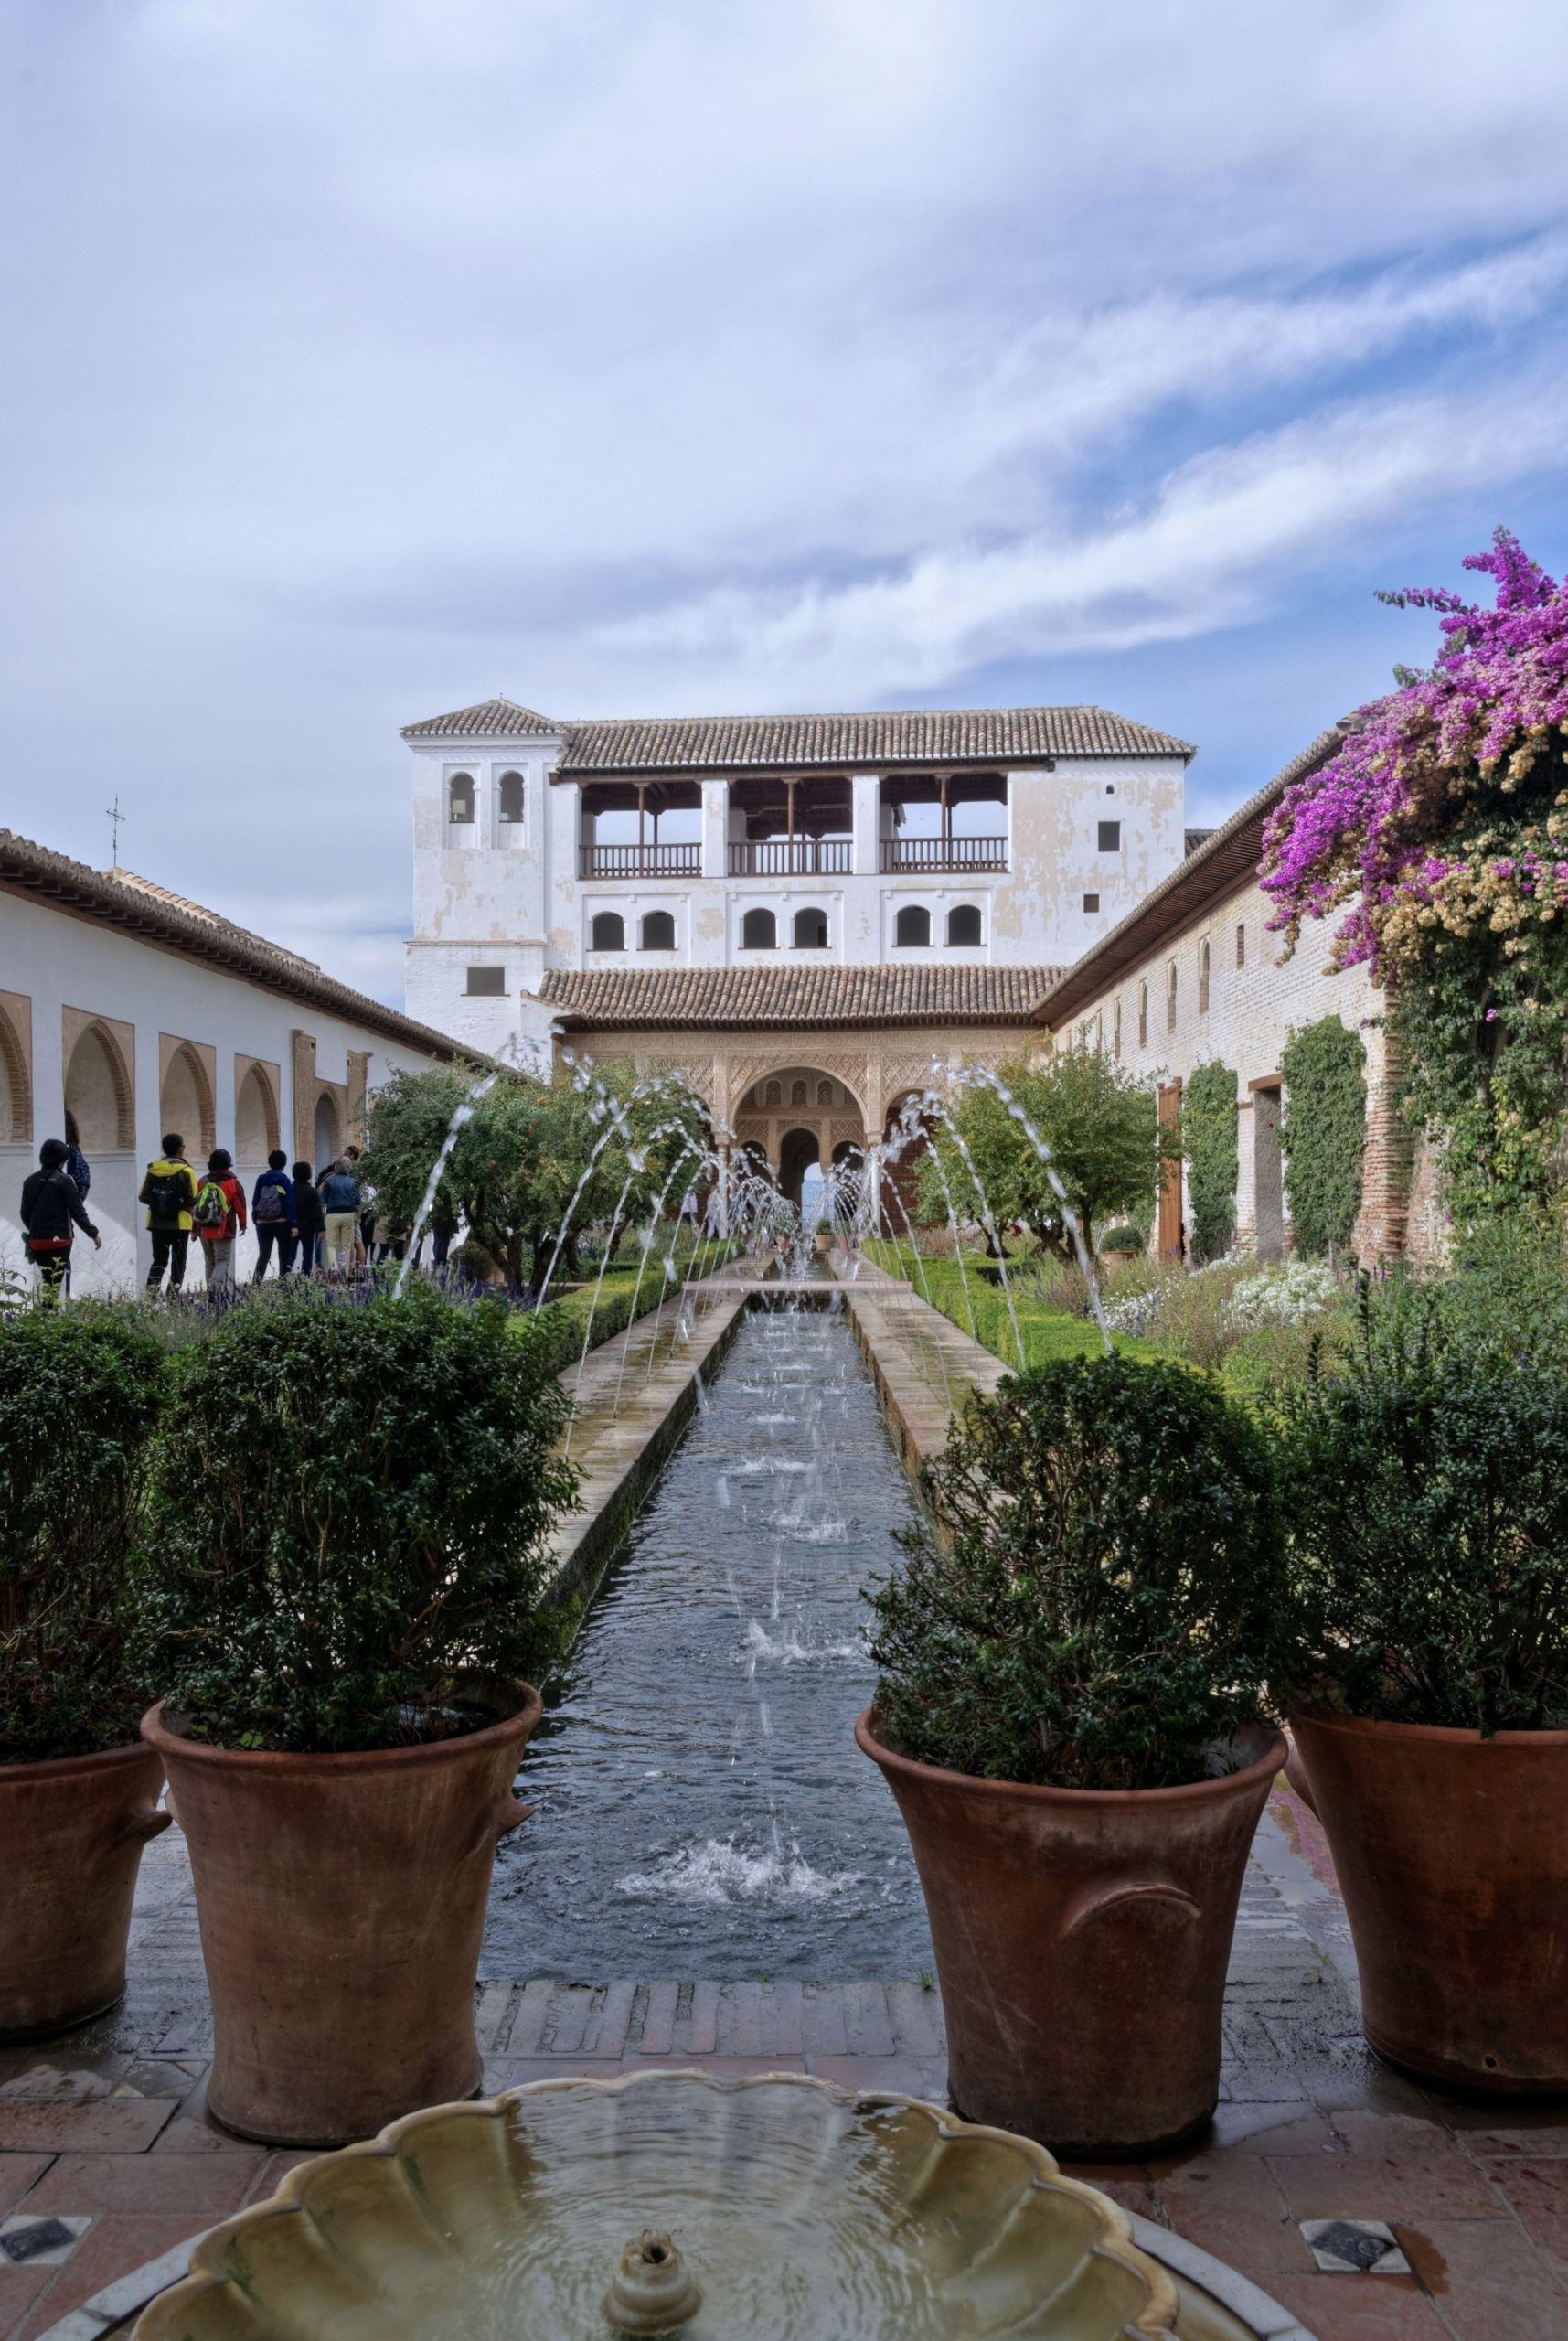 Spain Andalusia Granada BW 2015 10 25 15 39 55